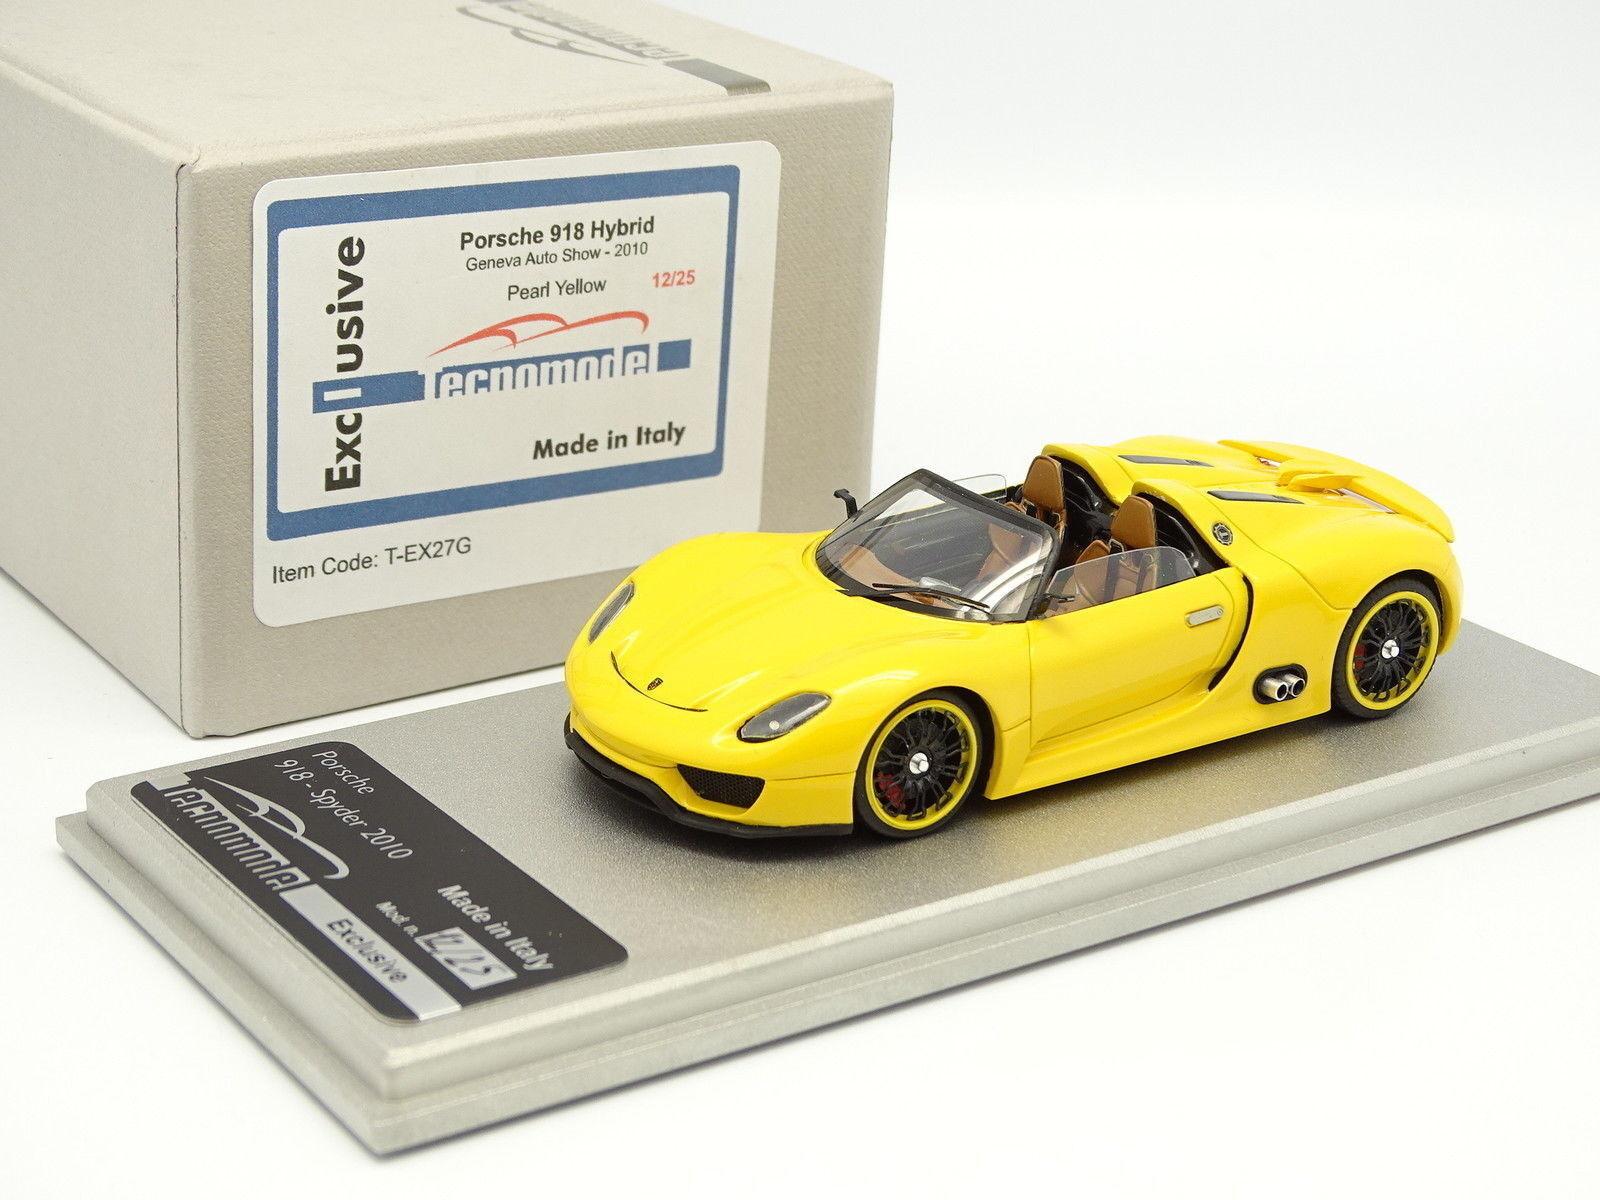 Tecnomodel 1 43 - Porsche 918 Hybrid Geneve 2010 Pearl Yellow 25 Ex